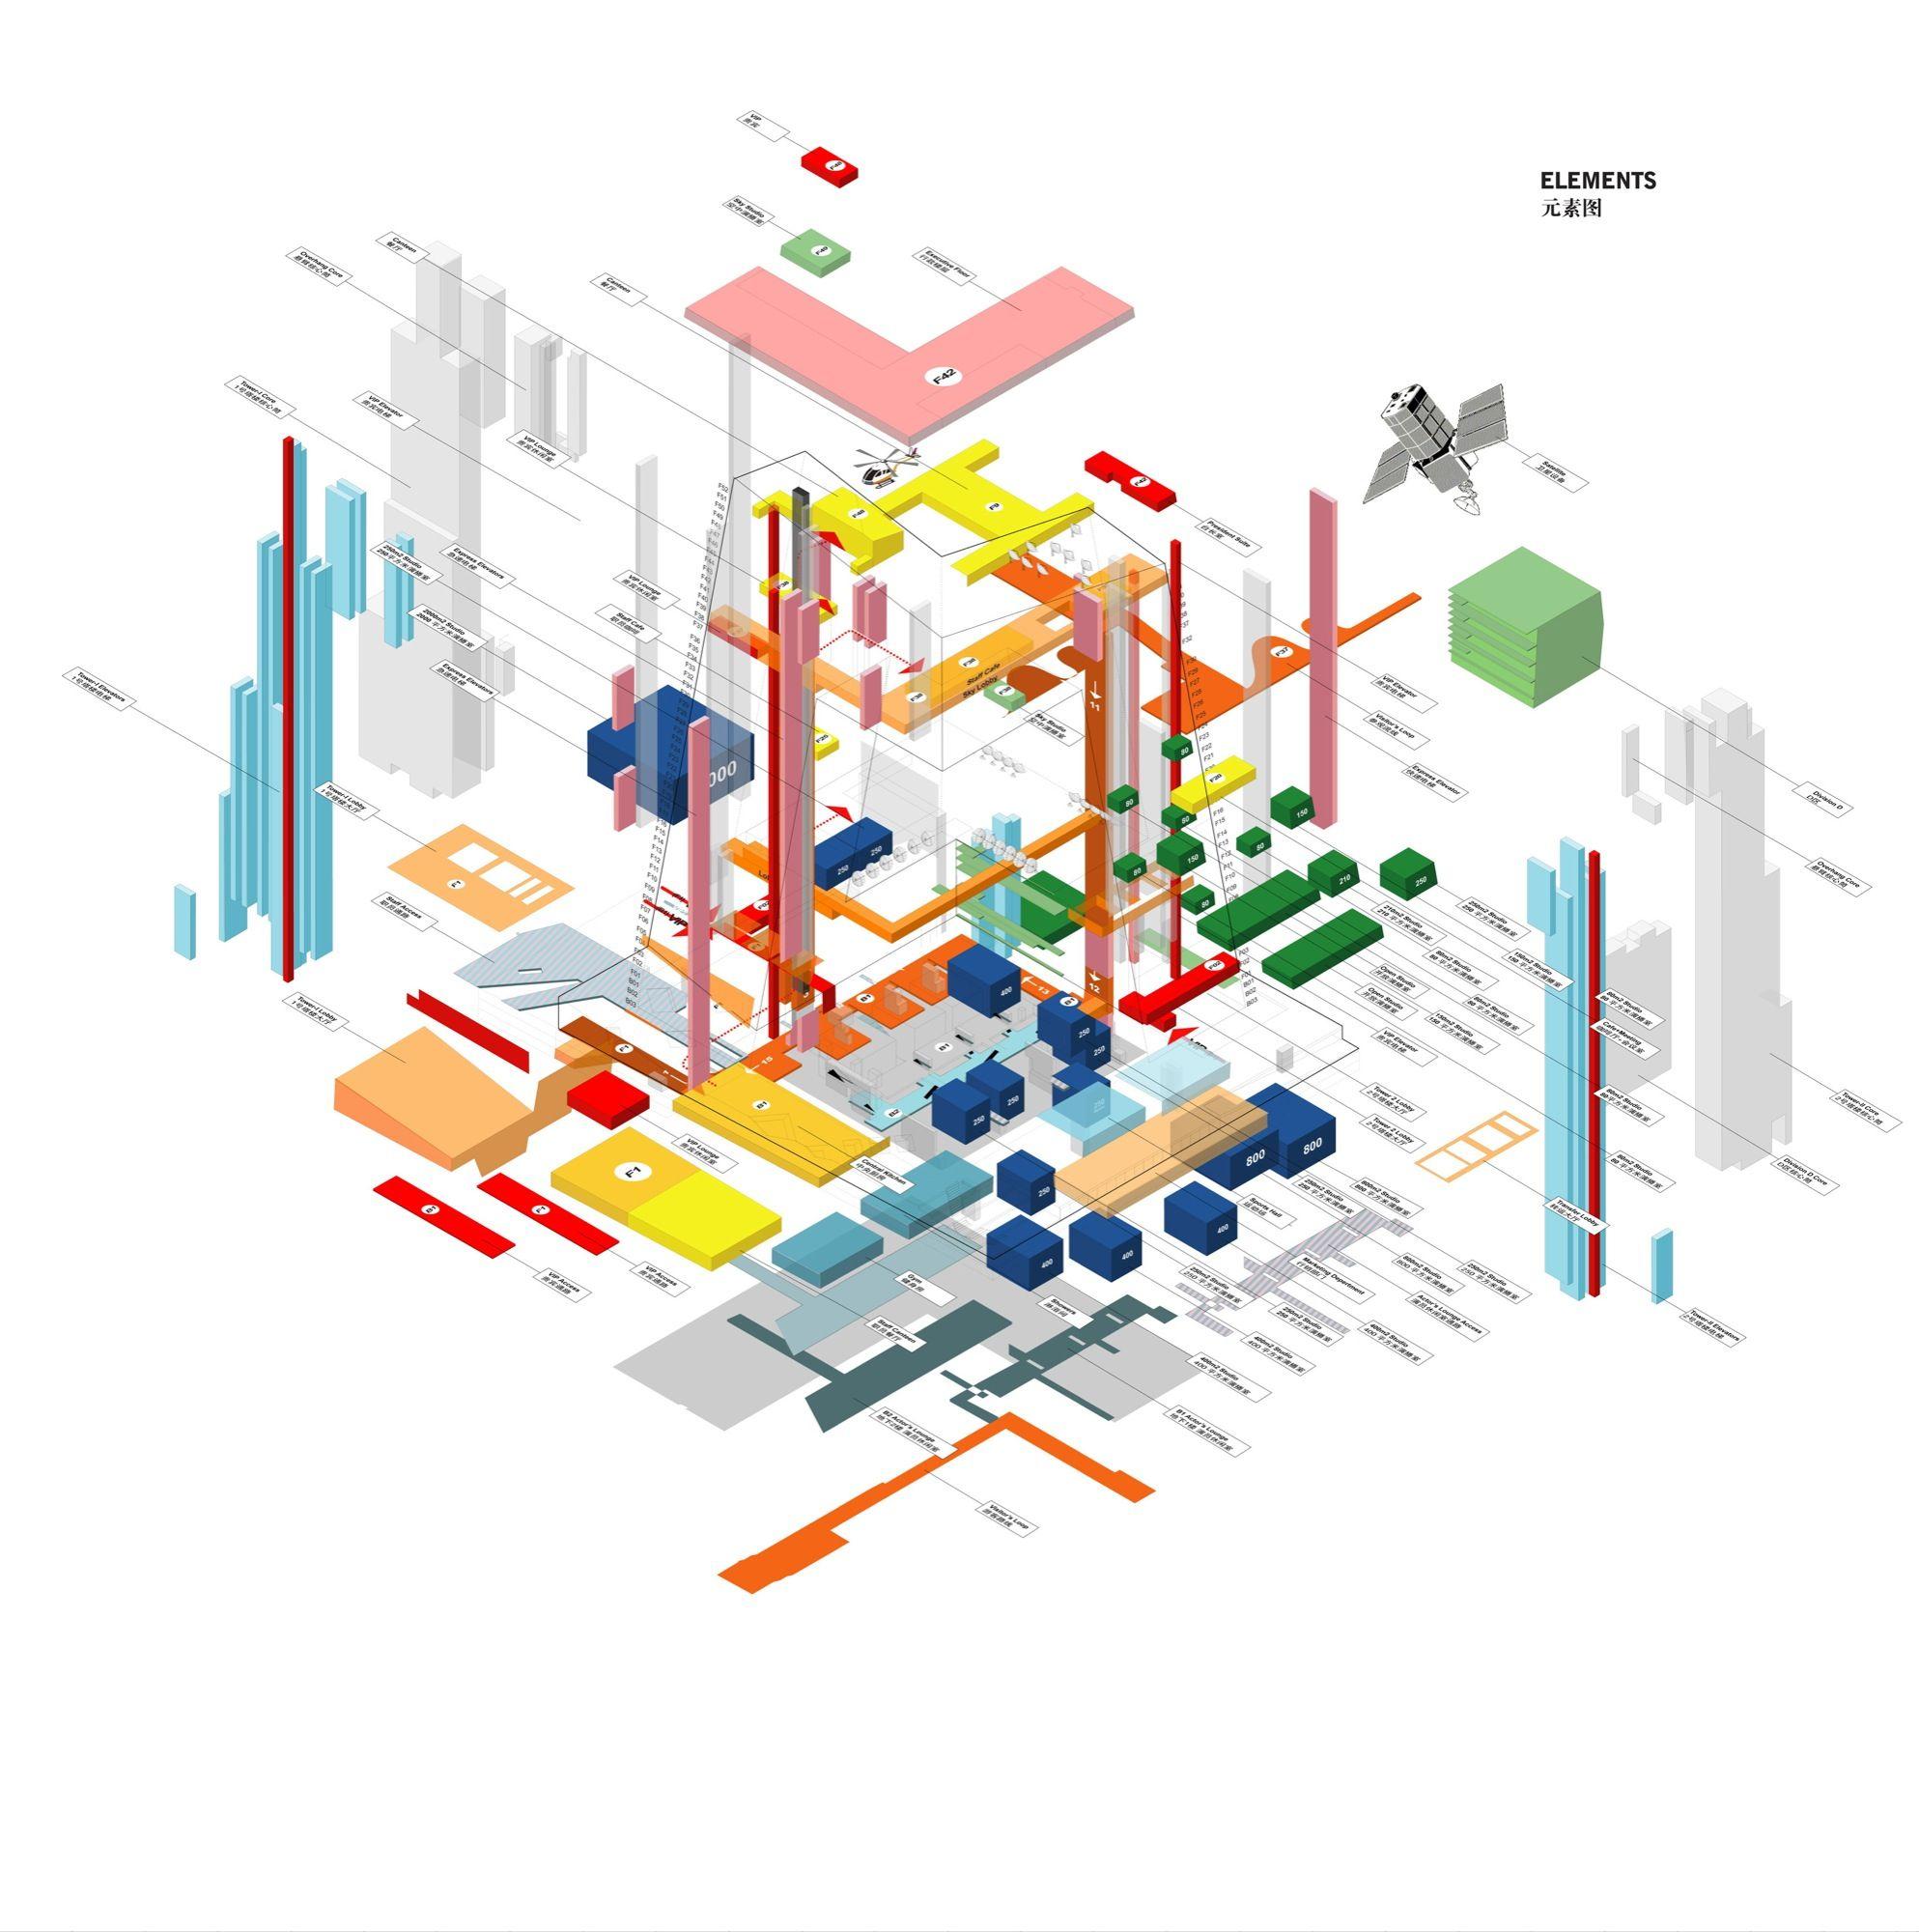 Galeria de sede cctv oma 29 diagram architecture diagrams galeria de sede cctv oma 29 pooptronica Choice Image